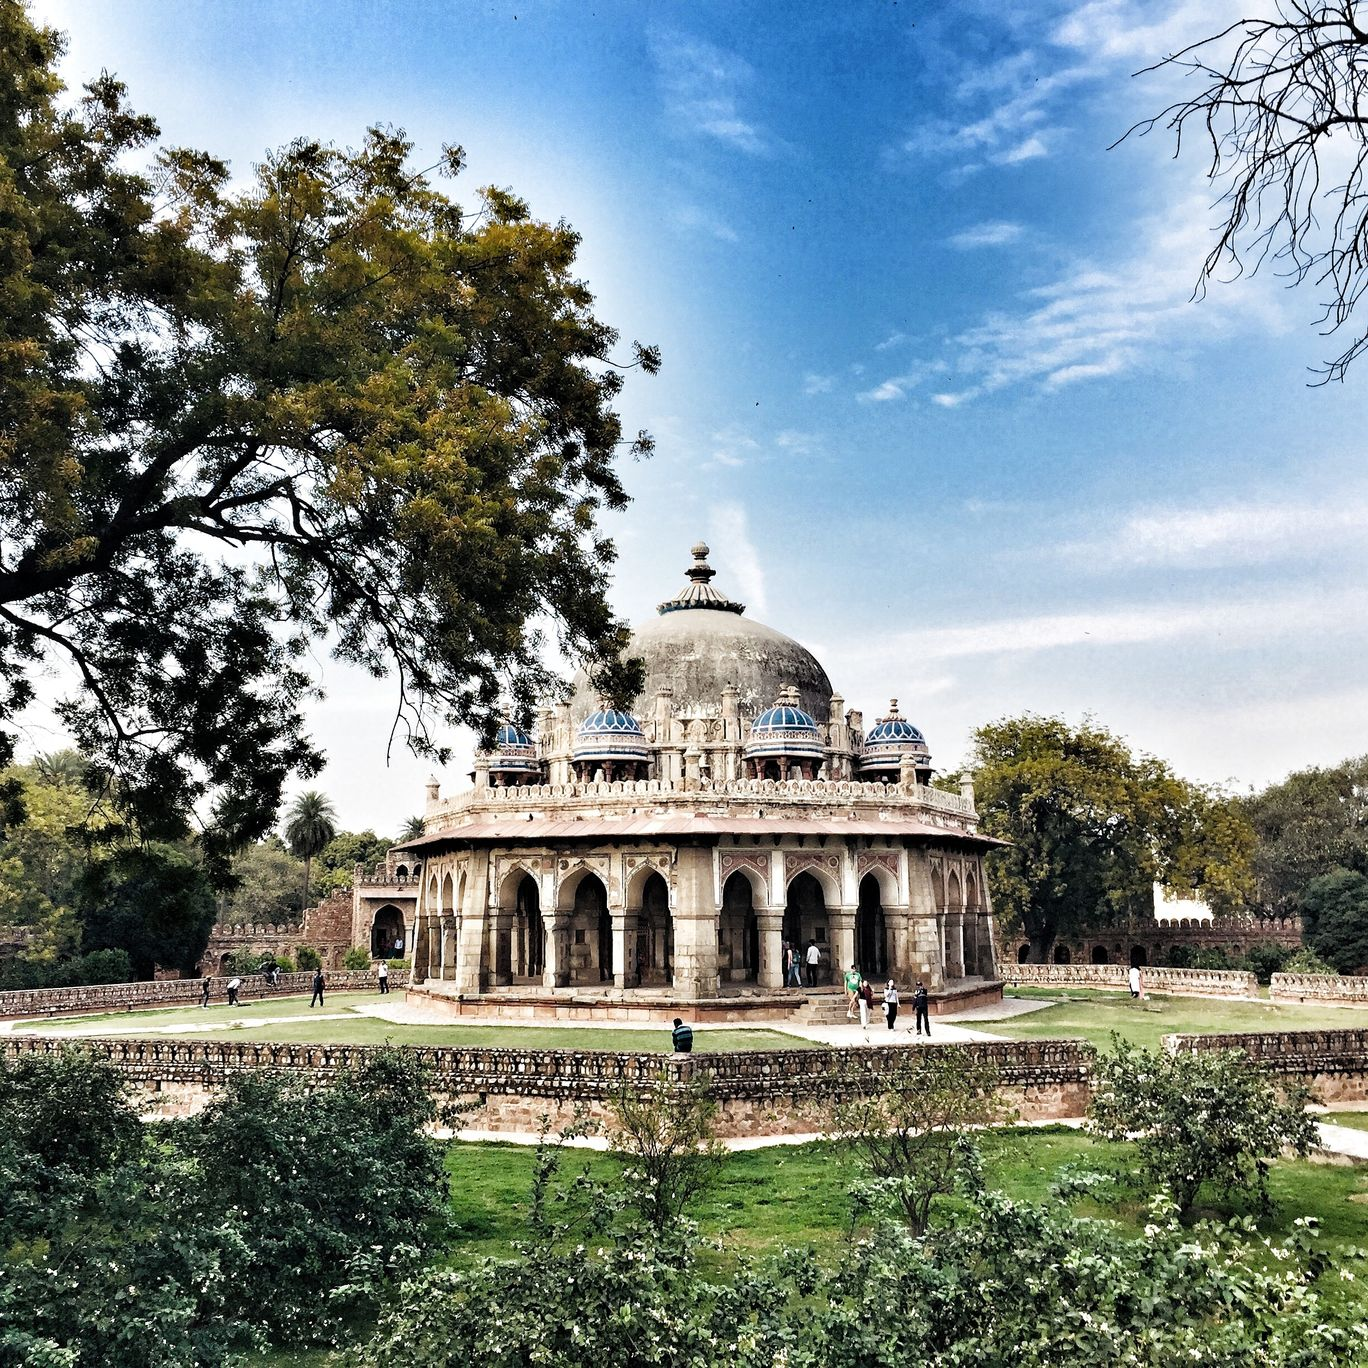 Photo of Isa Khan's Tomb By tanya